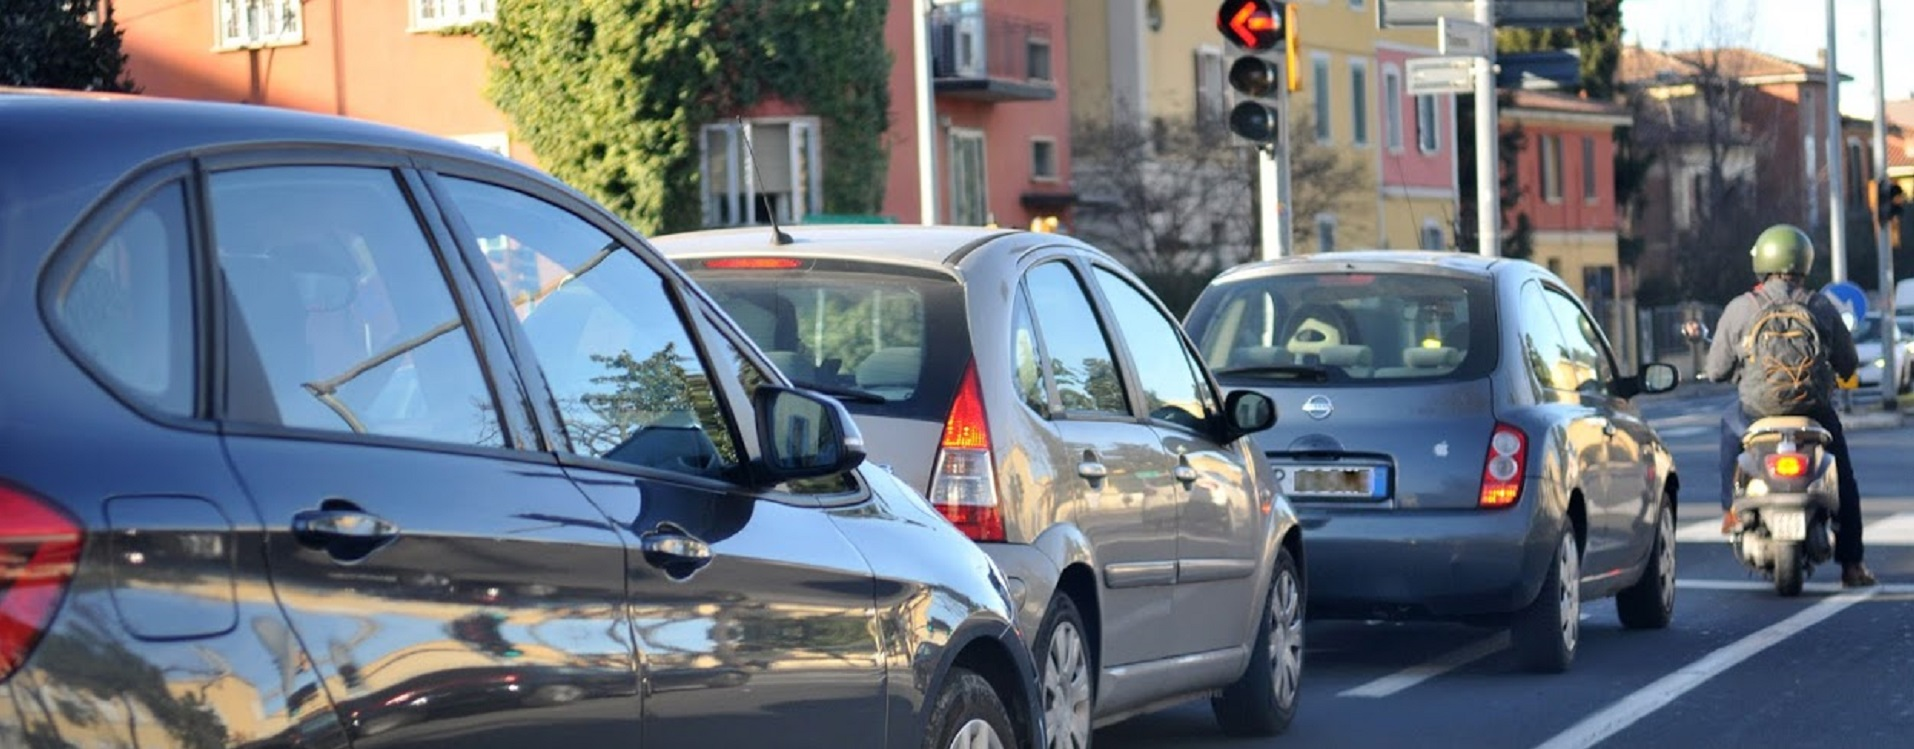 Immagine di traffico